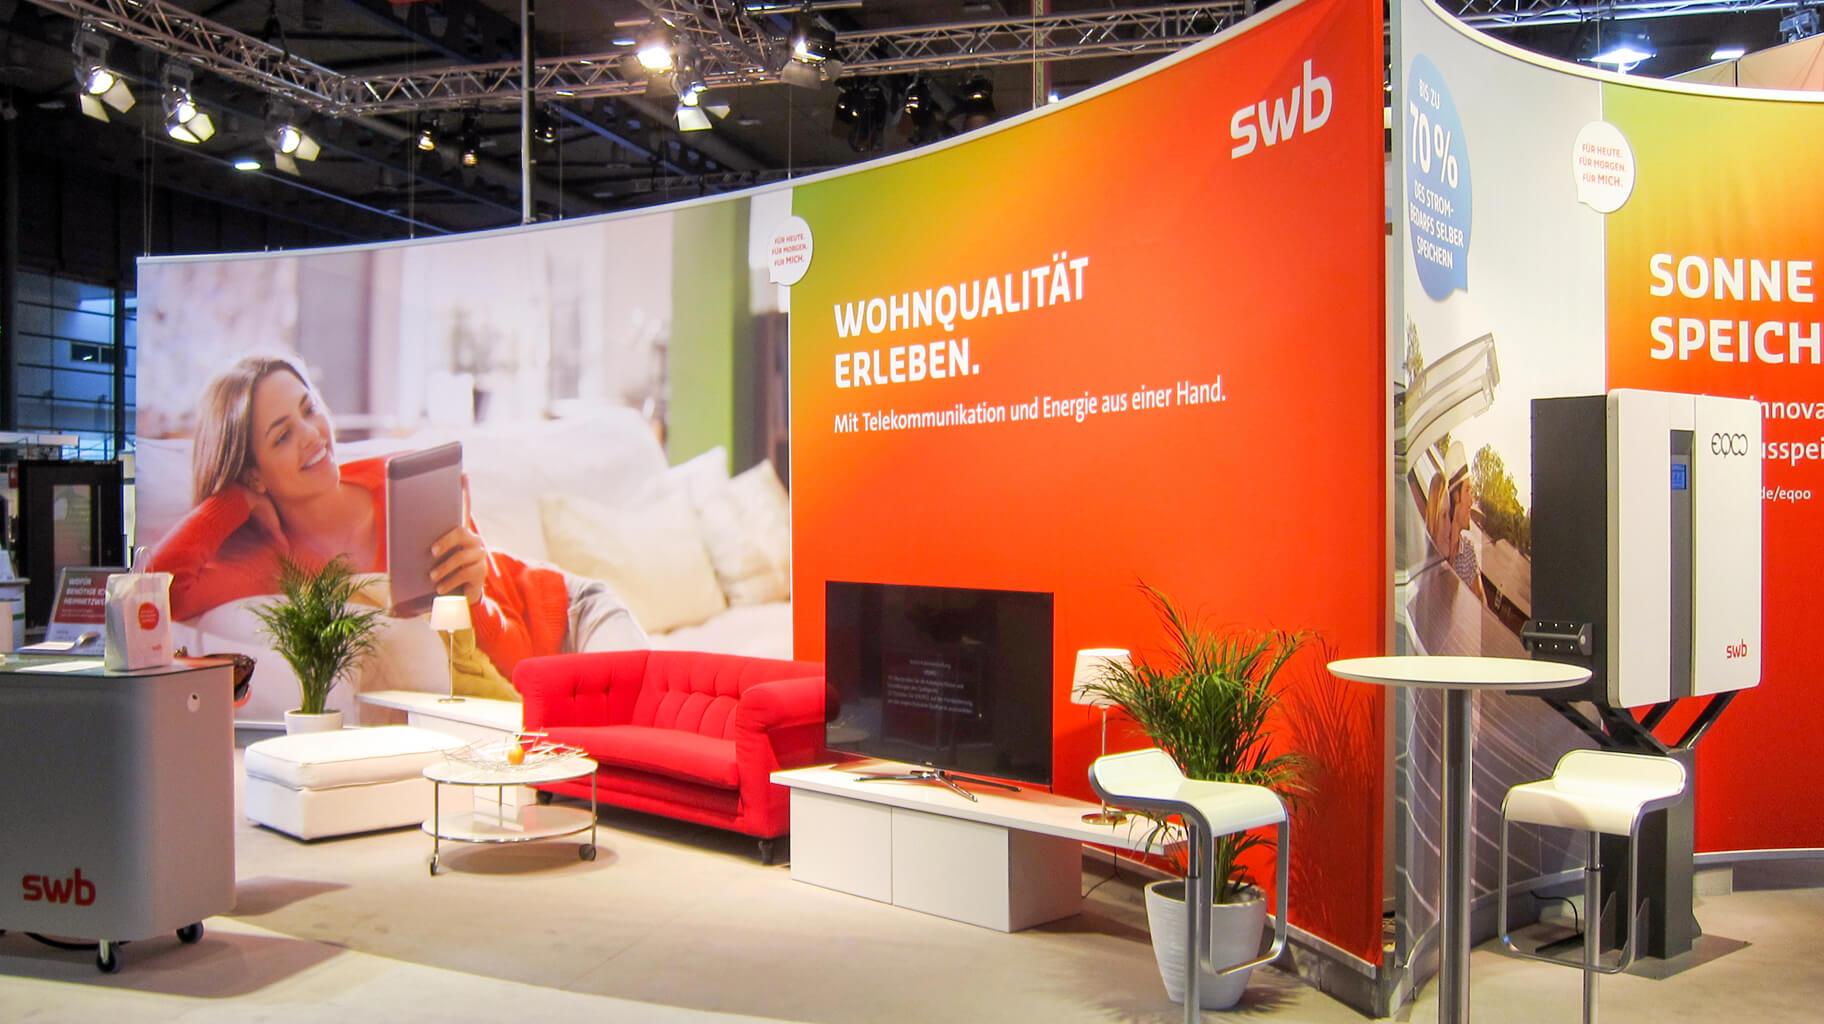 Anka Werbung - Messebau Bremen - Messebau (swb HanseBau 2016)